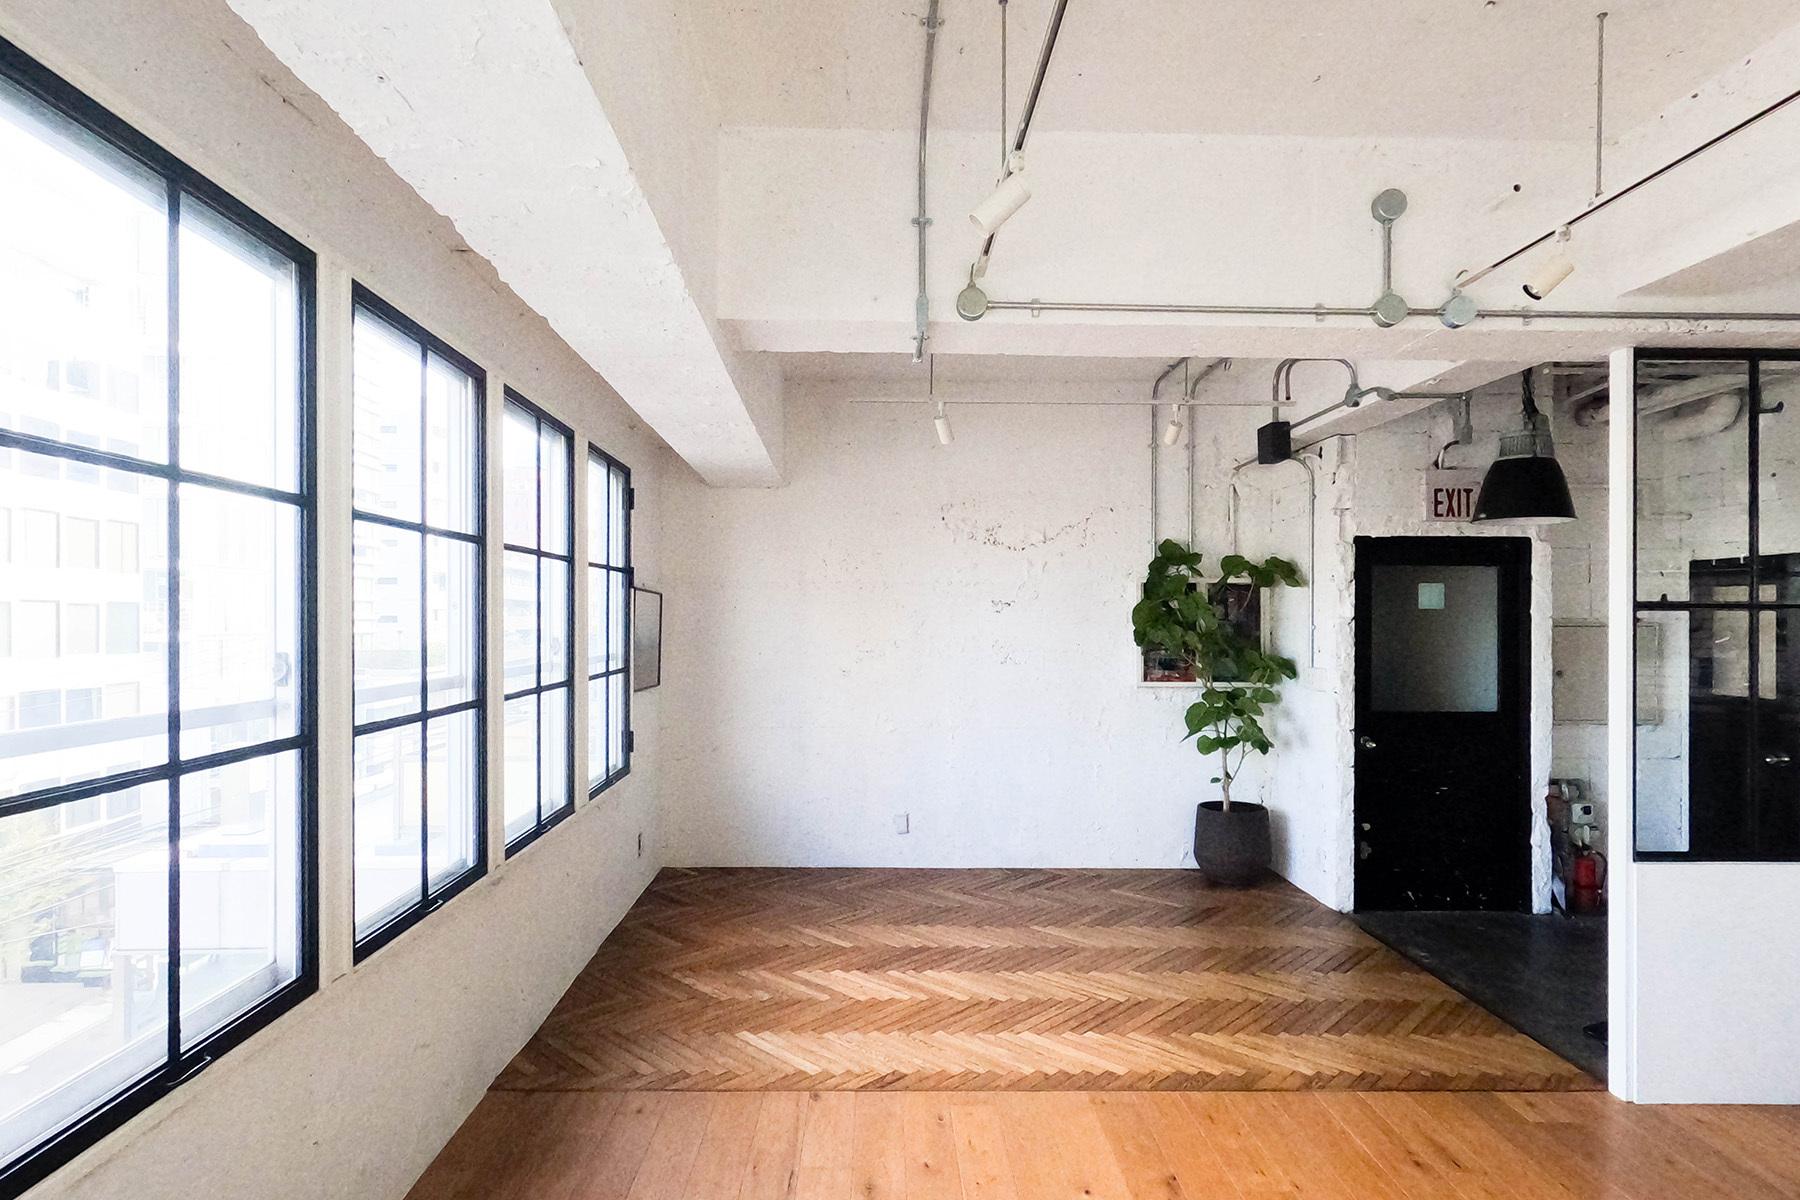 atelier rauque Cstudio (アトリエロークCスタジオ)キッチン前にテーブルを移動